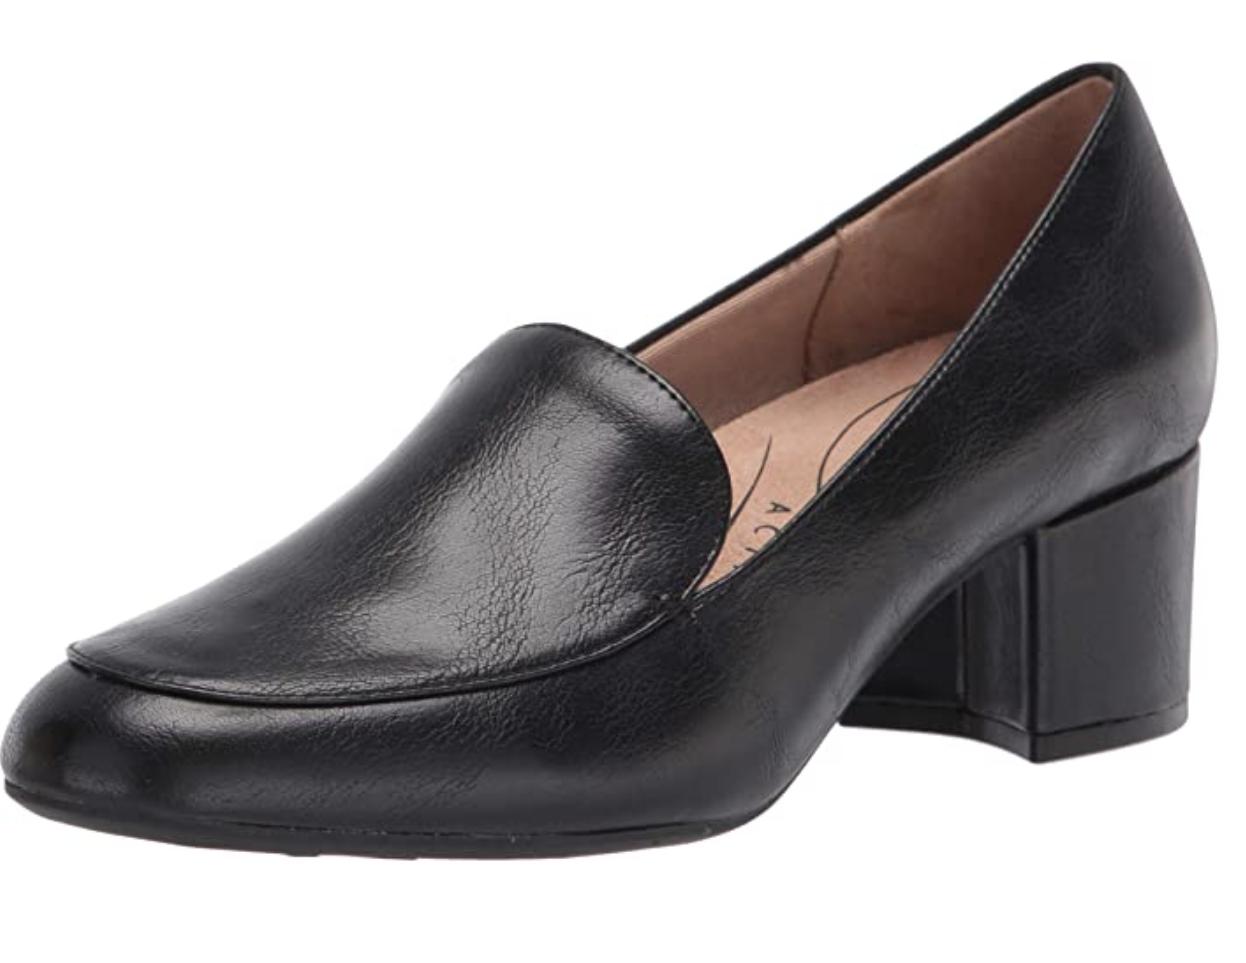 LifeStride Women's Trixie Pump; Best Comfortable Work Shoes For Women